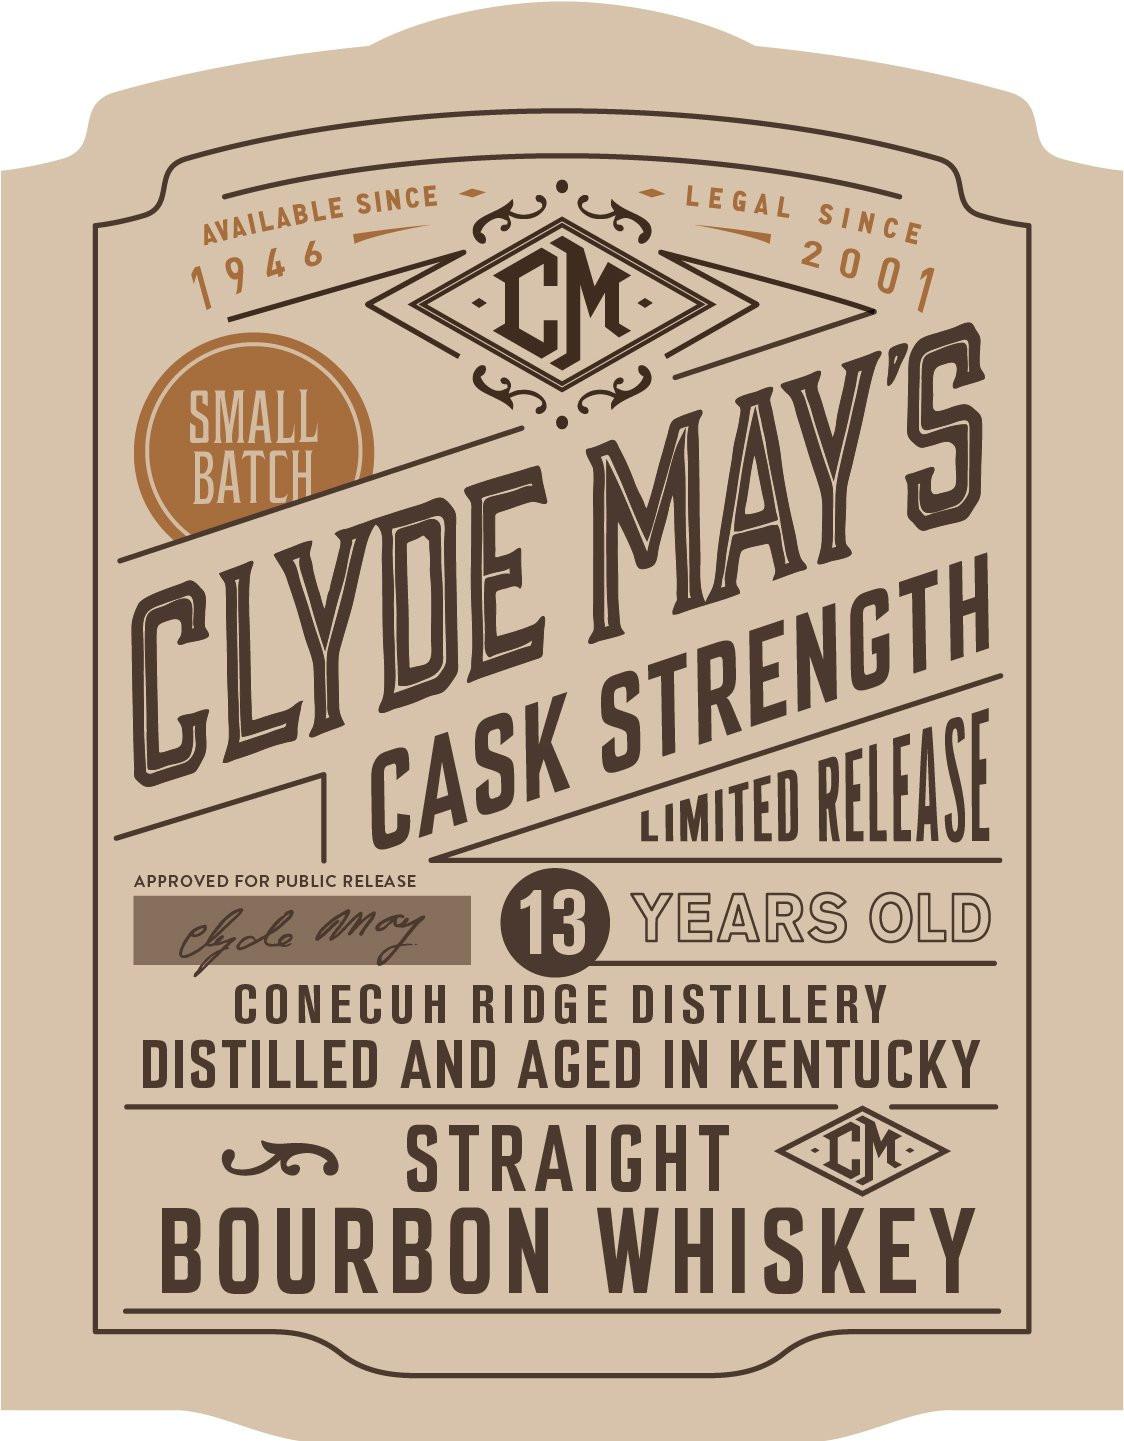 Clyde May's 13Yr Cask Strength Bourbon 750ml